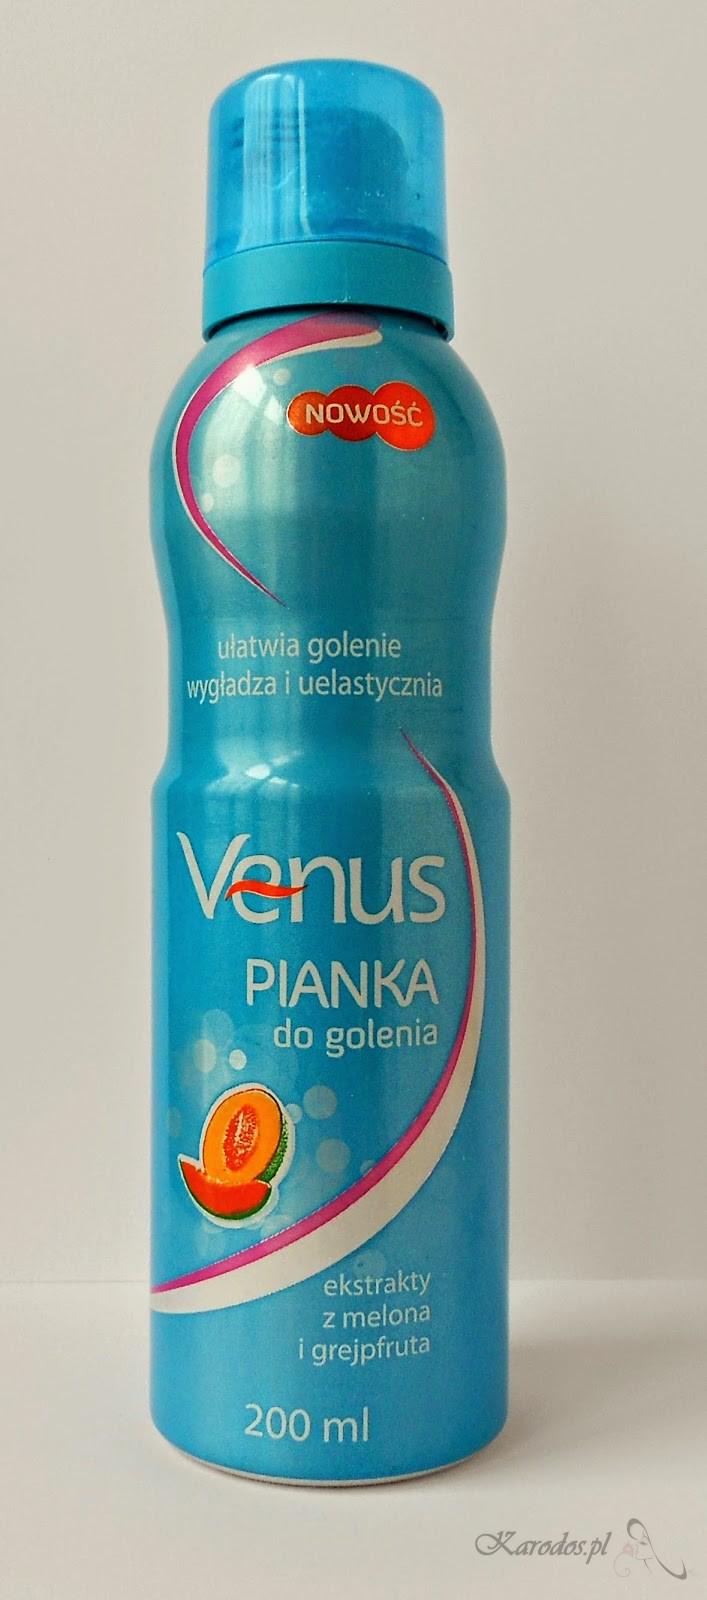 Pharma CF, Venus, Pianka do golenia dla kobiet (ekstrakty z melona i grejpfruta)